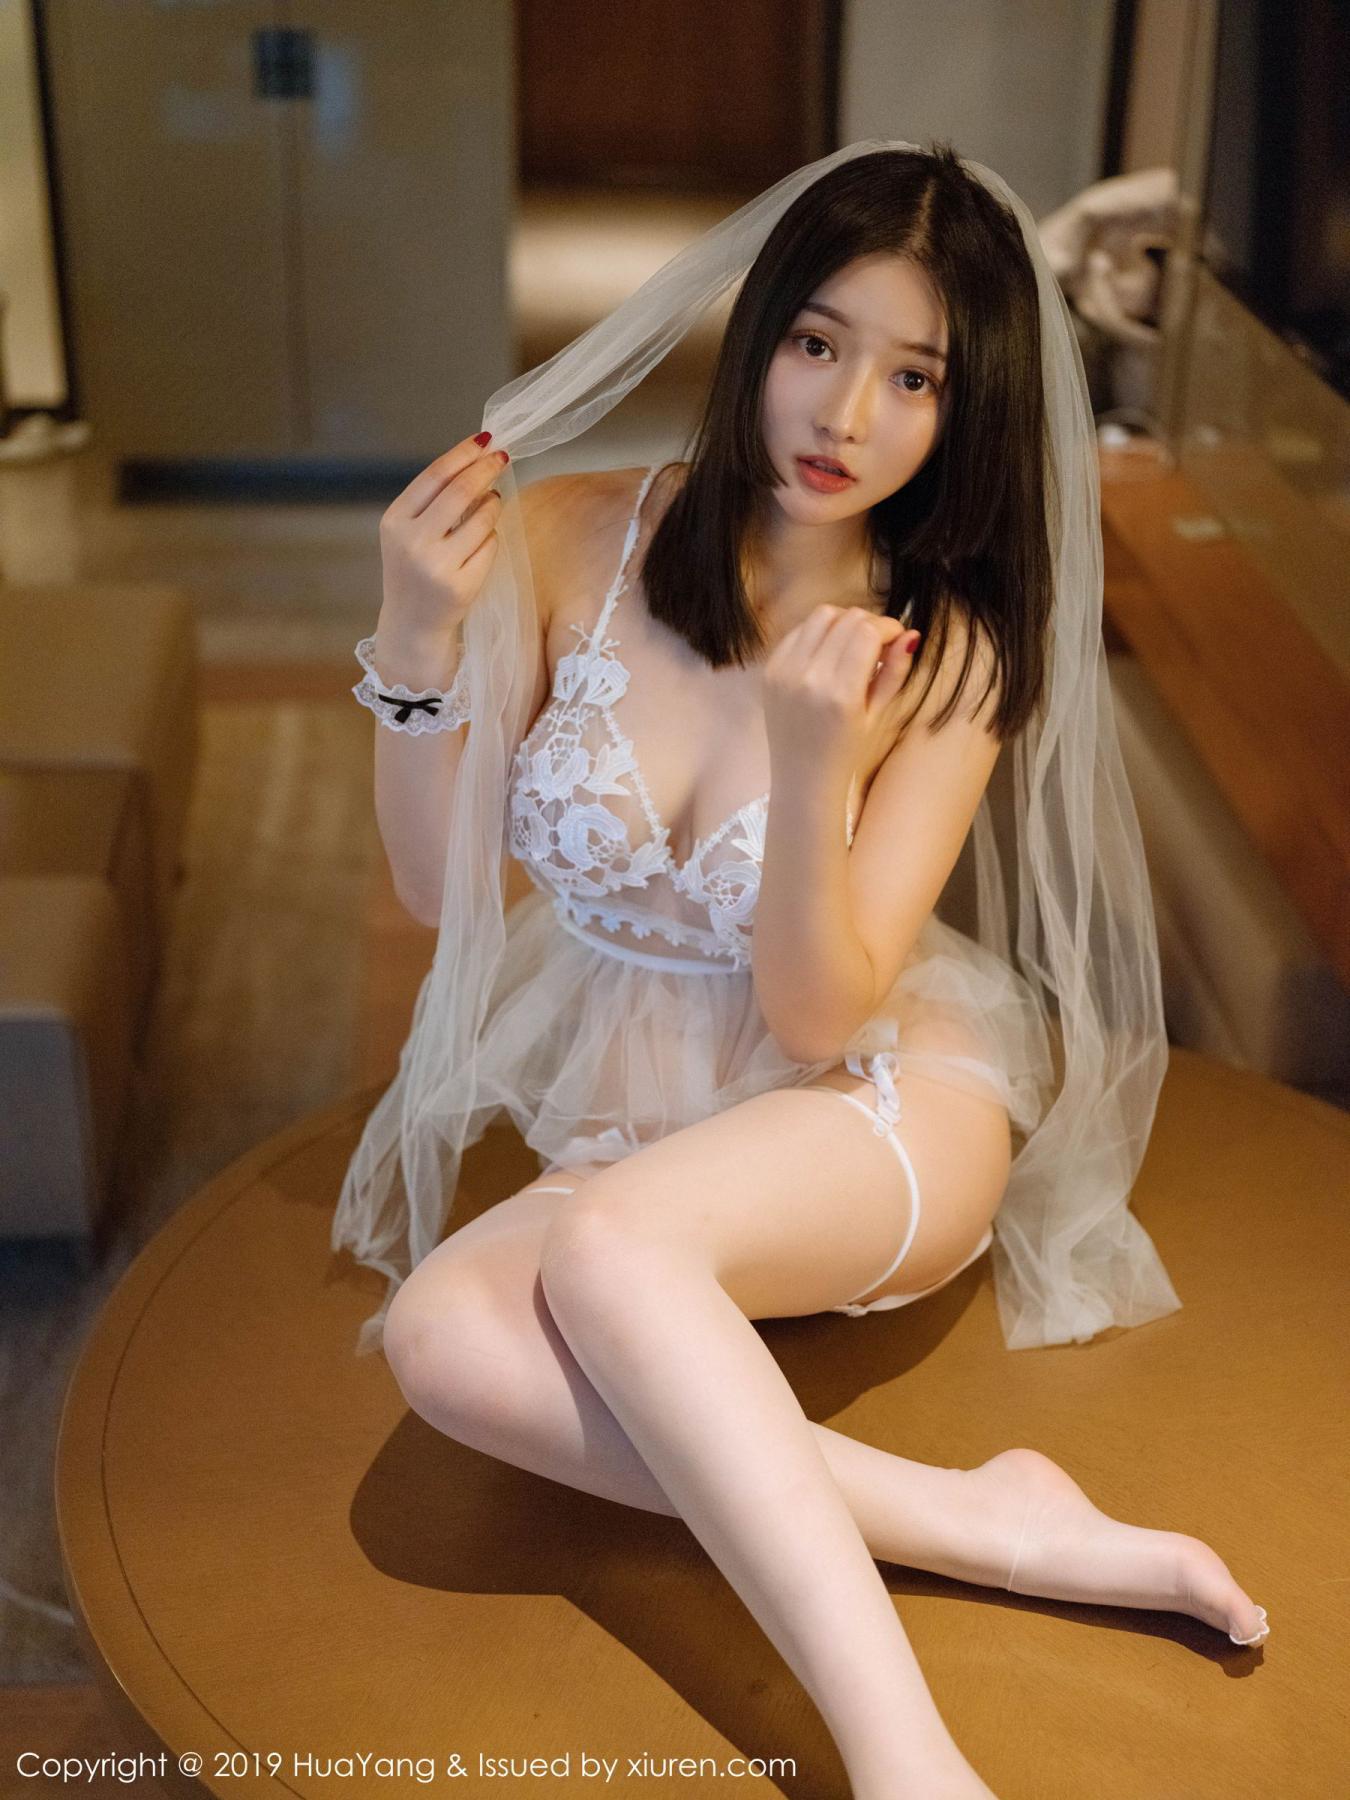 [Huayang] Vol.122 Bride Tang Wan Er 1P, HuaYang, Tang Wan Er, Underwear